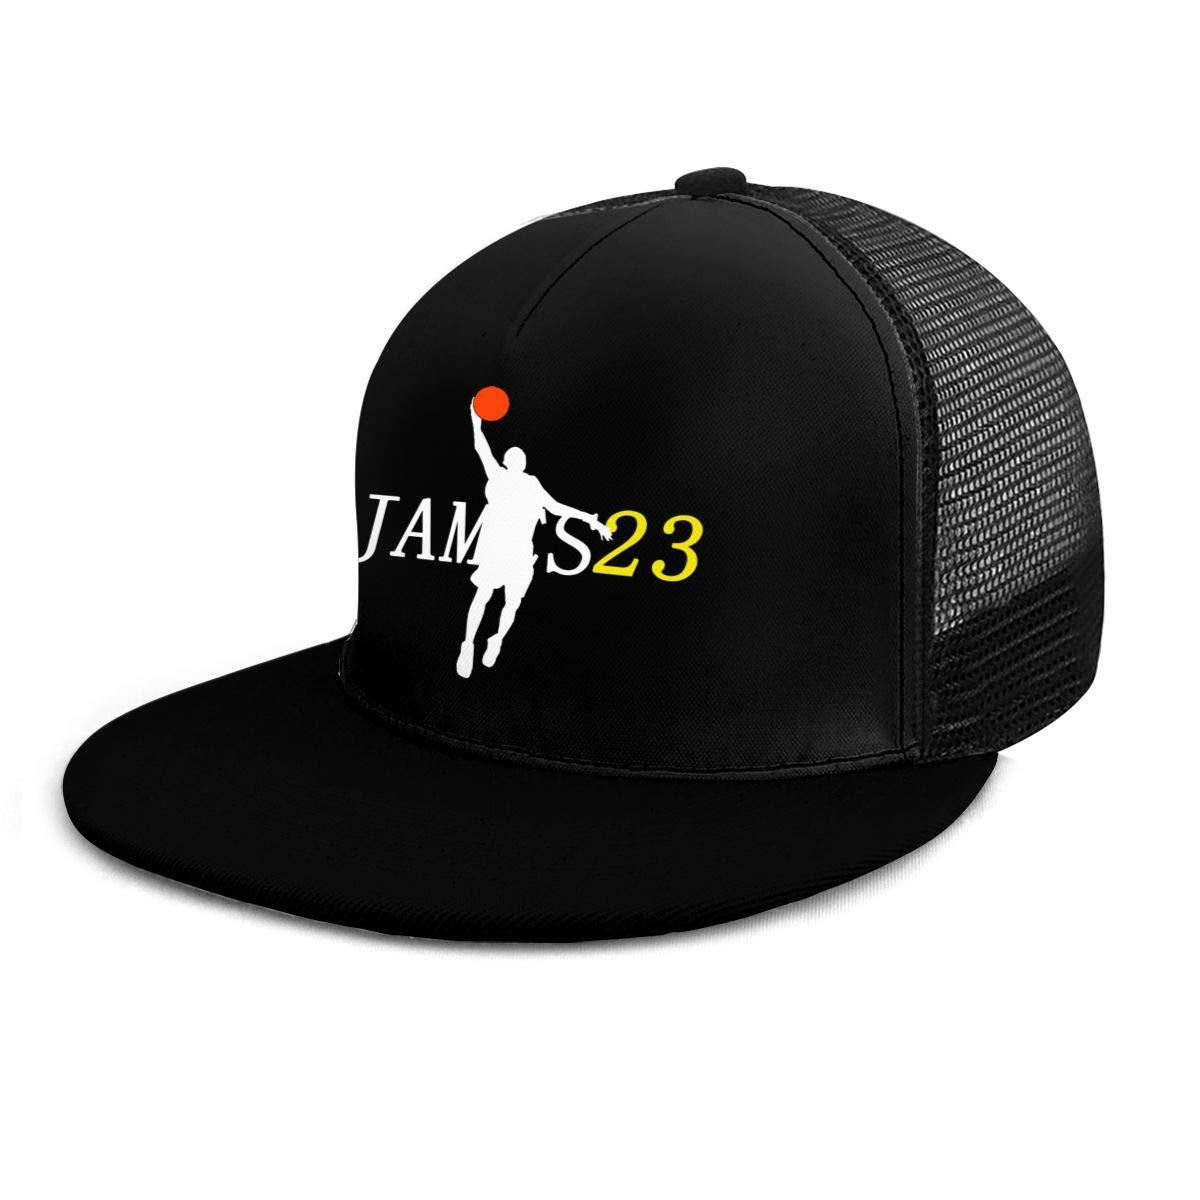 NNBAi Unisex Adjustable Flat Mesh Lebron-James Basketball Baseball Cap Black